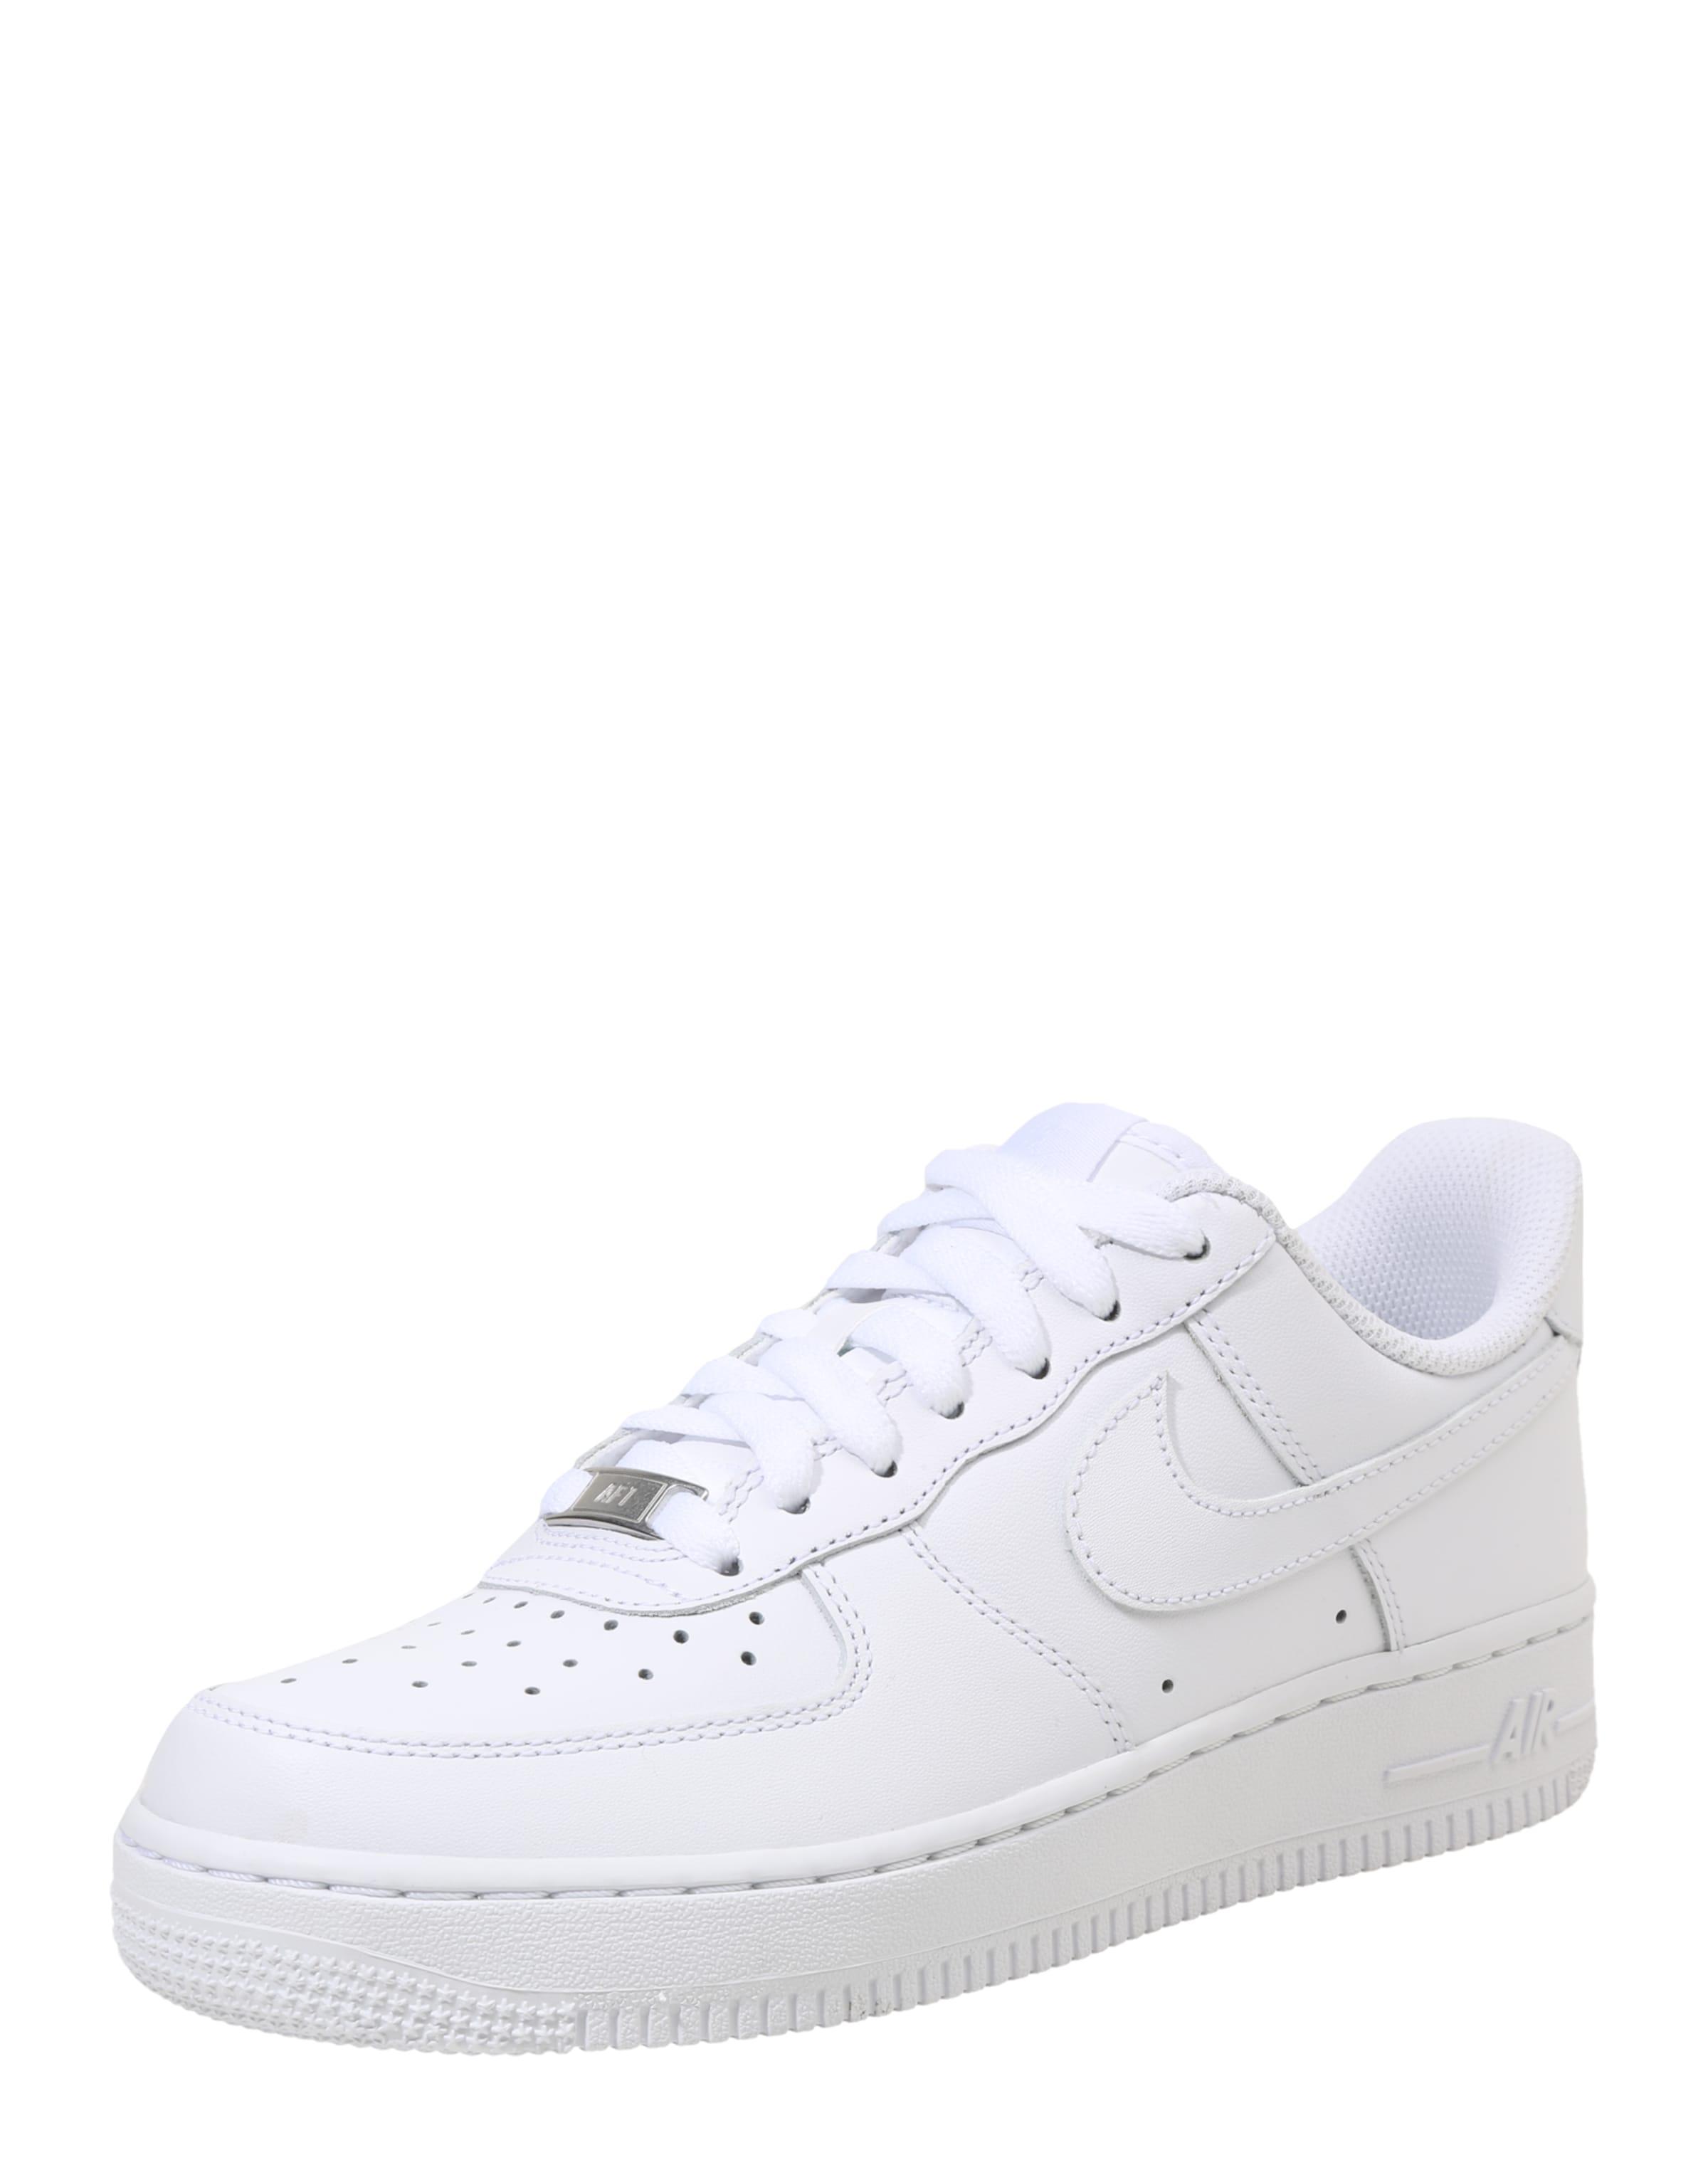 Baskets Nike Basses 'air 1' Force En Blanc Sportswear TFKJ1c3l